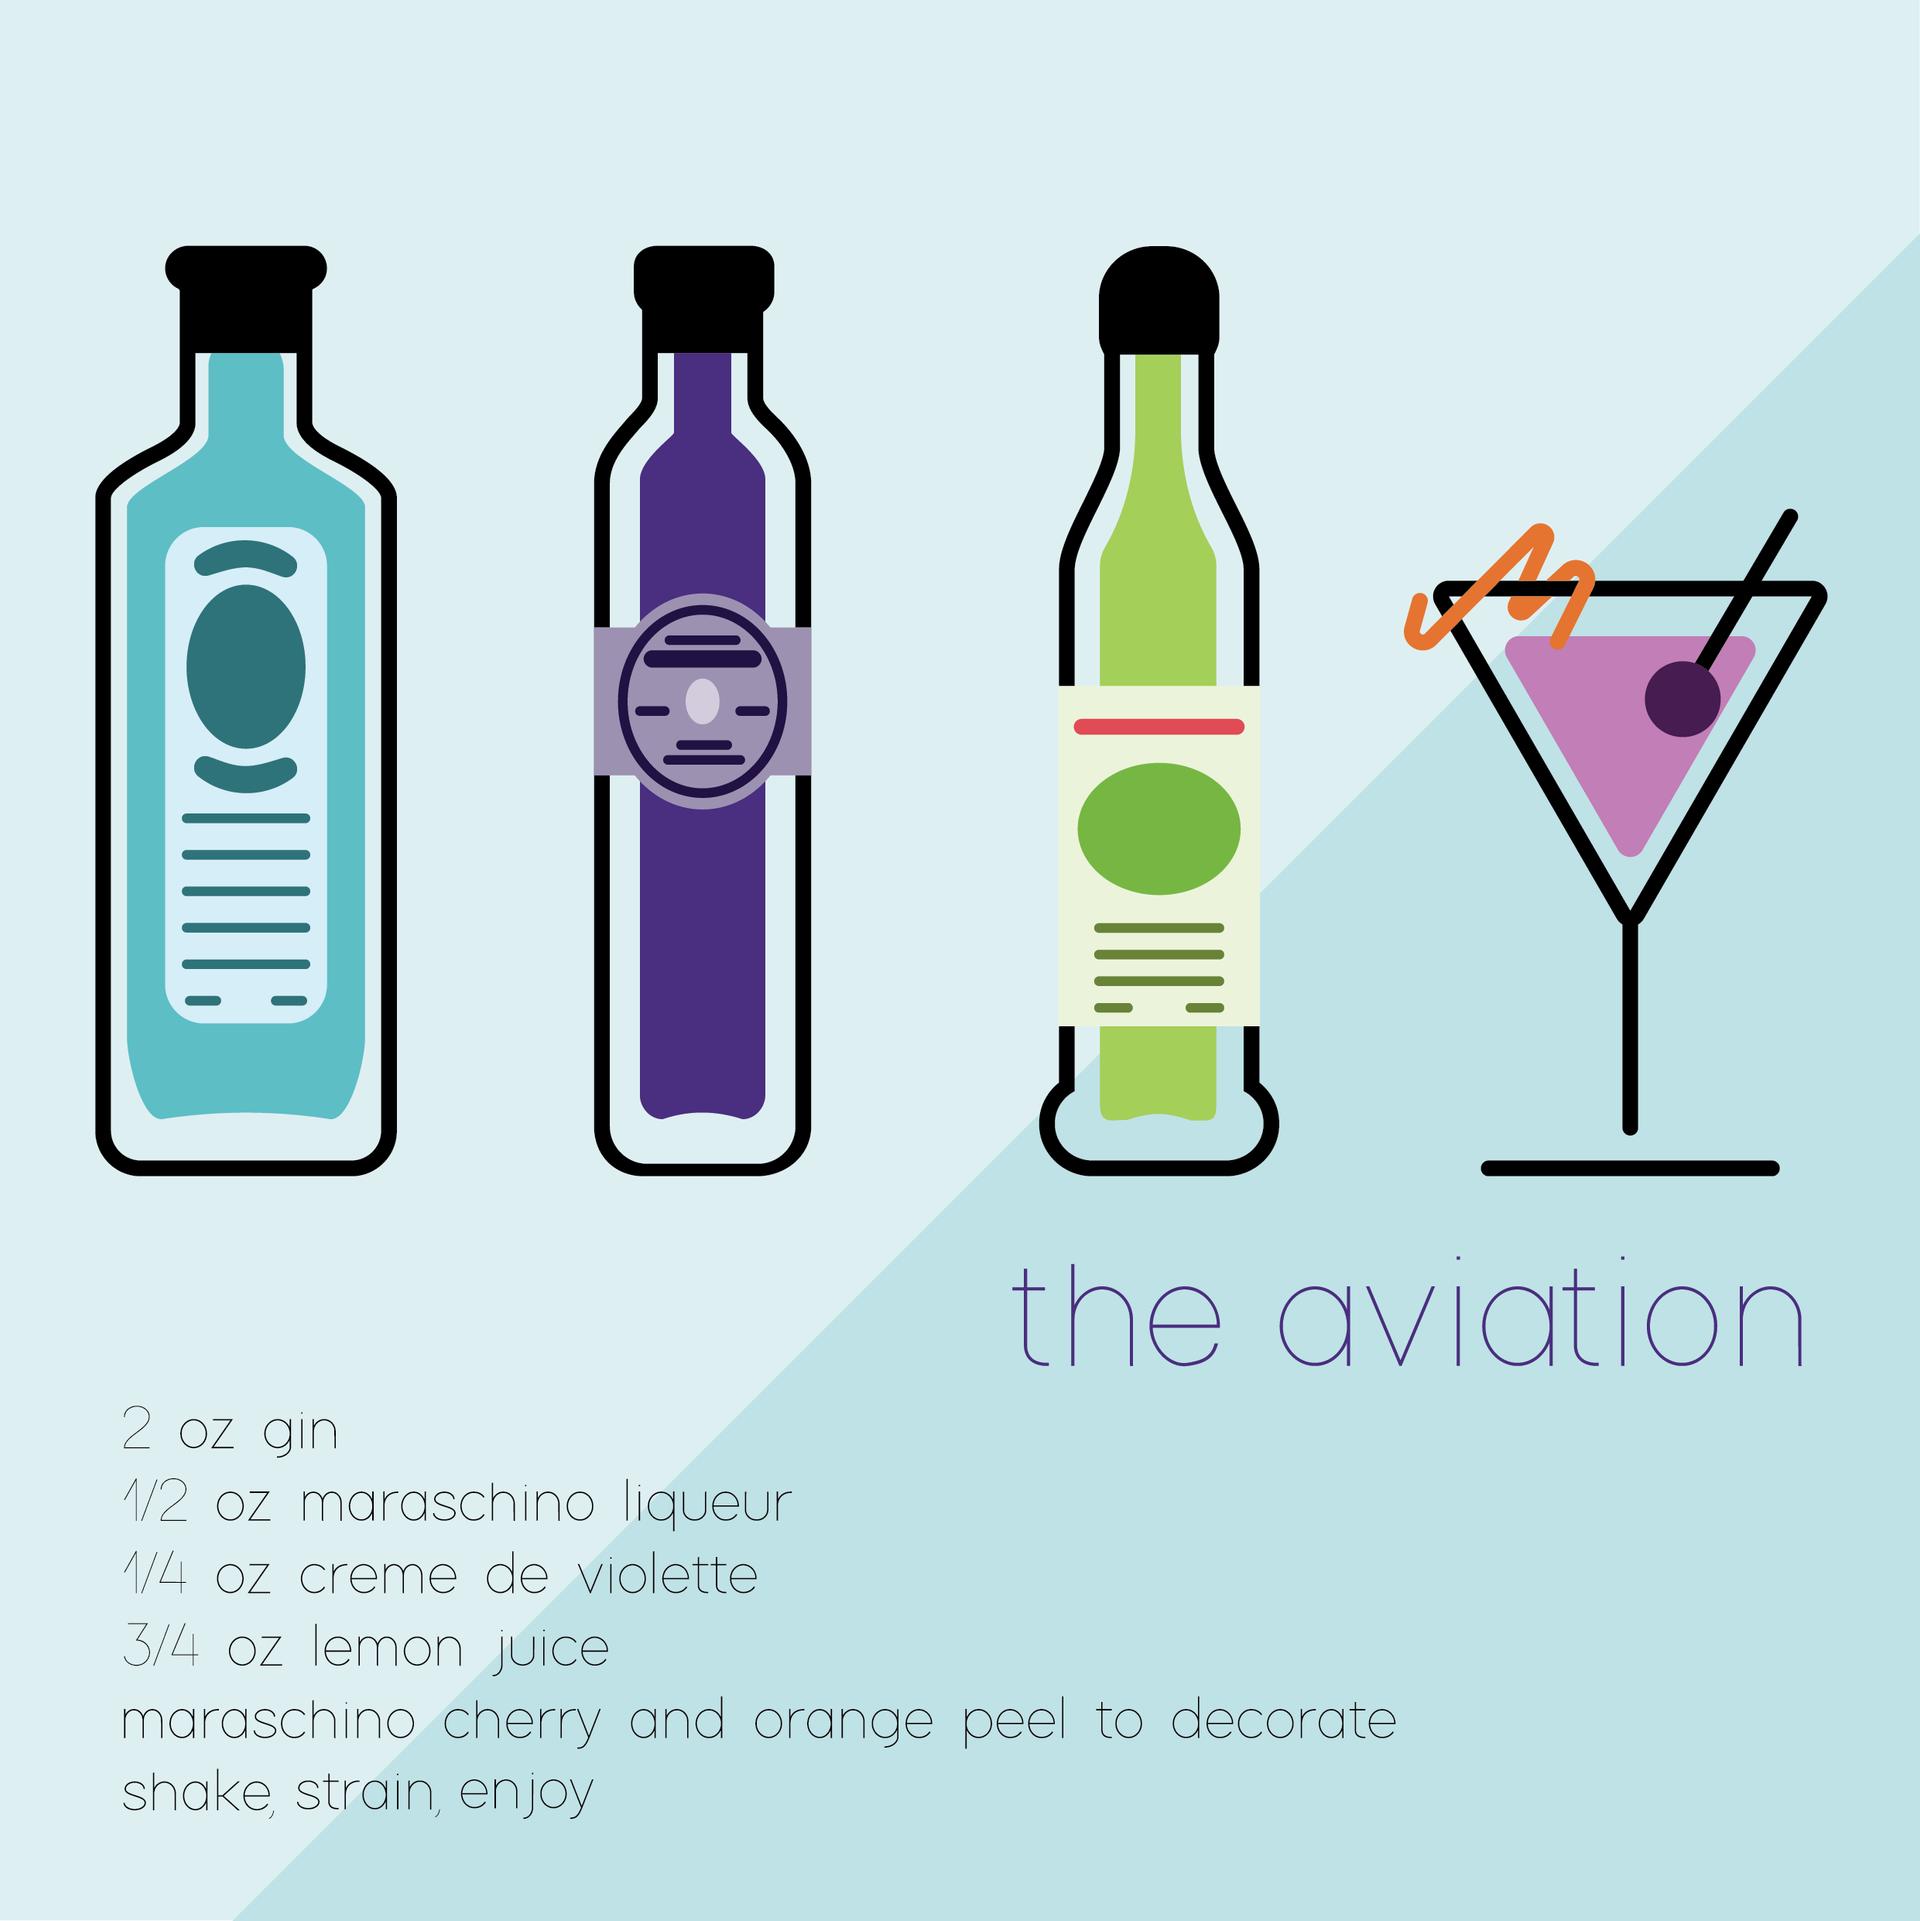 The Aviation